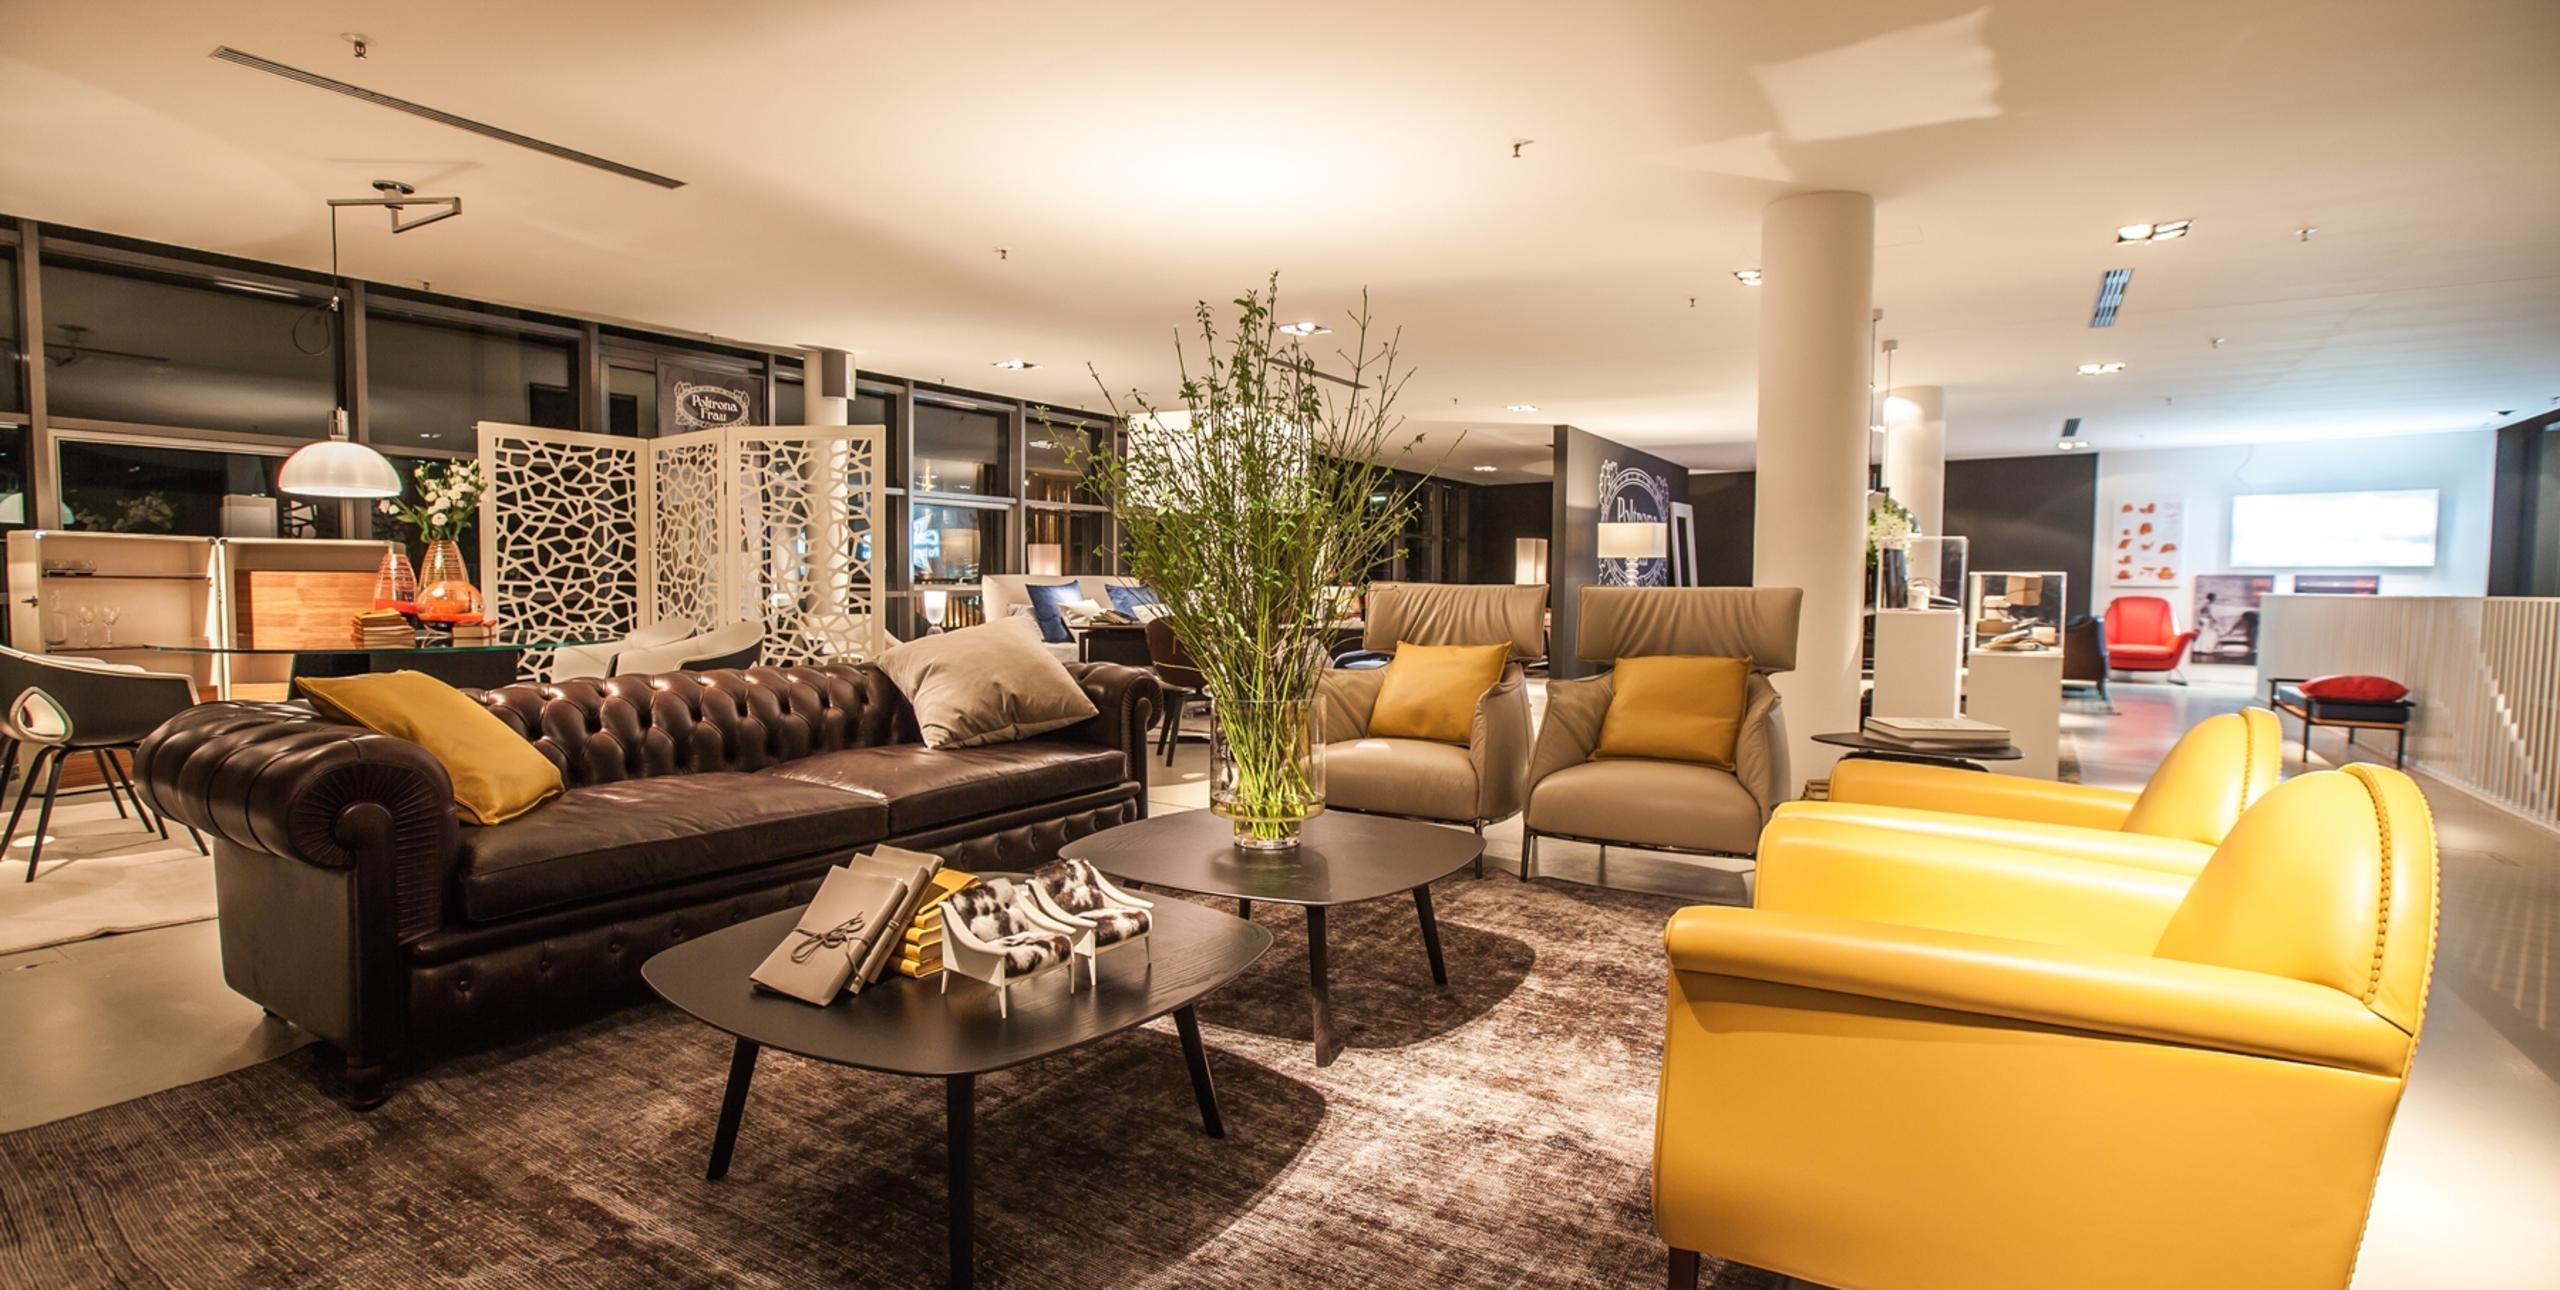 divano chester one di poltrona frau design renzo frau arredamento design. Black Bedroom Furniture Sets. Home Design Ideas